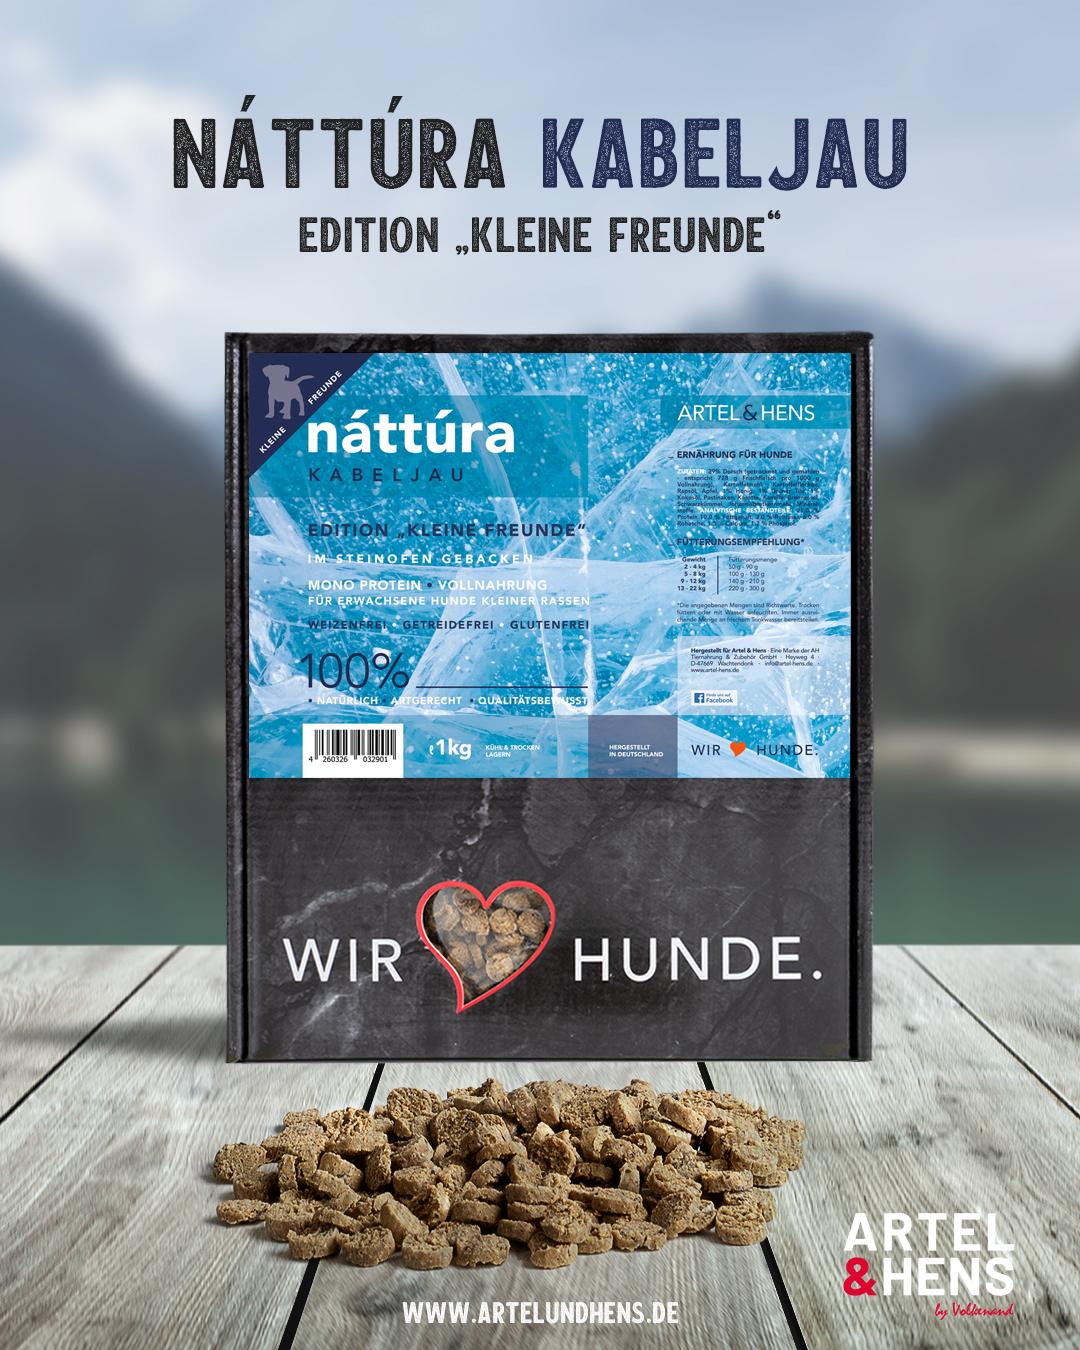 Artel & Hens Trockenfutter - Náttúra - kleine Freunde - Kabeljau